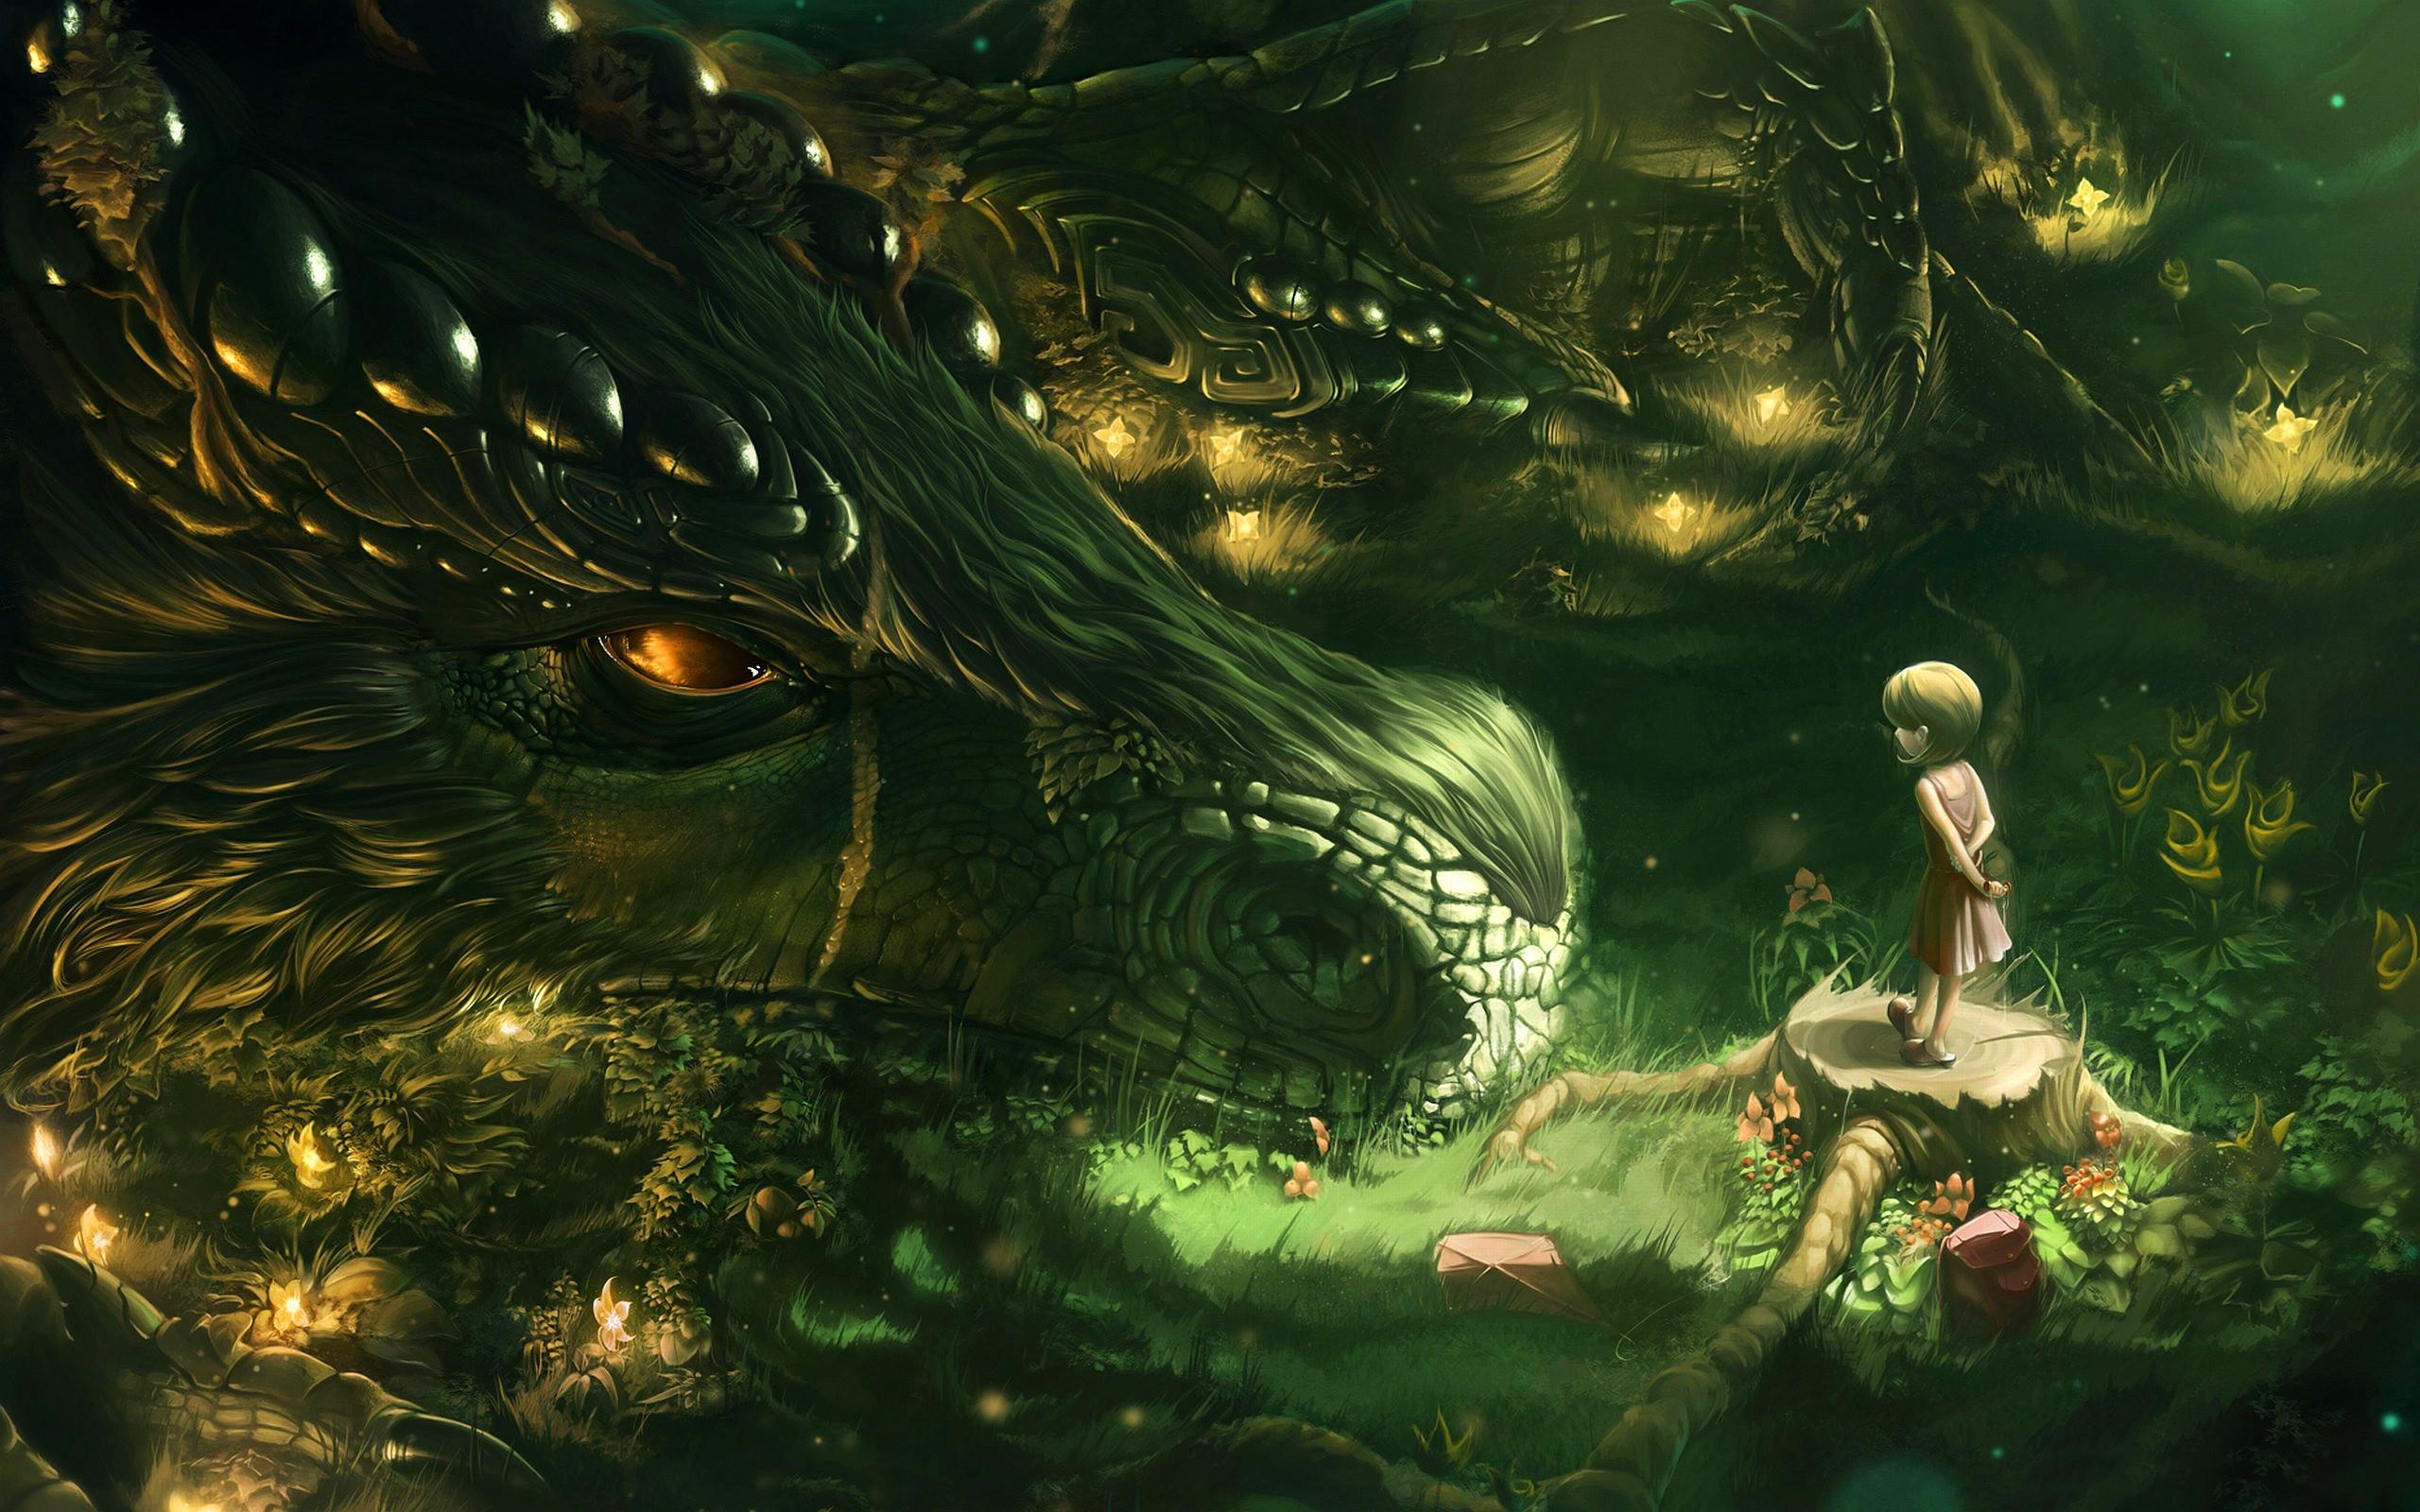 Fantasy Dragon Wallpapers Wallpapertag